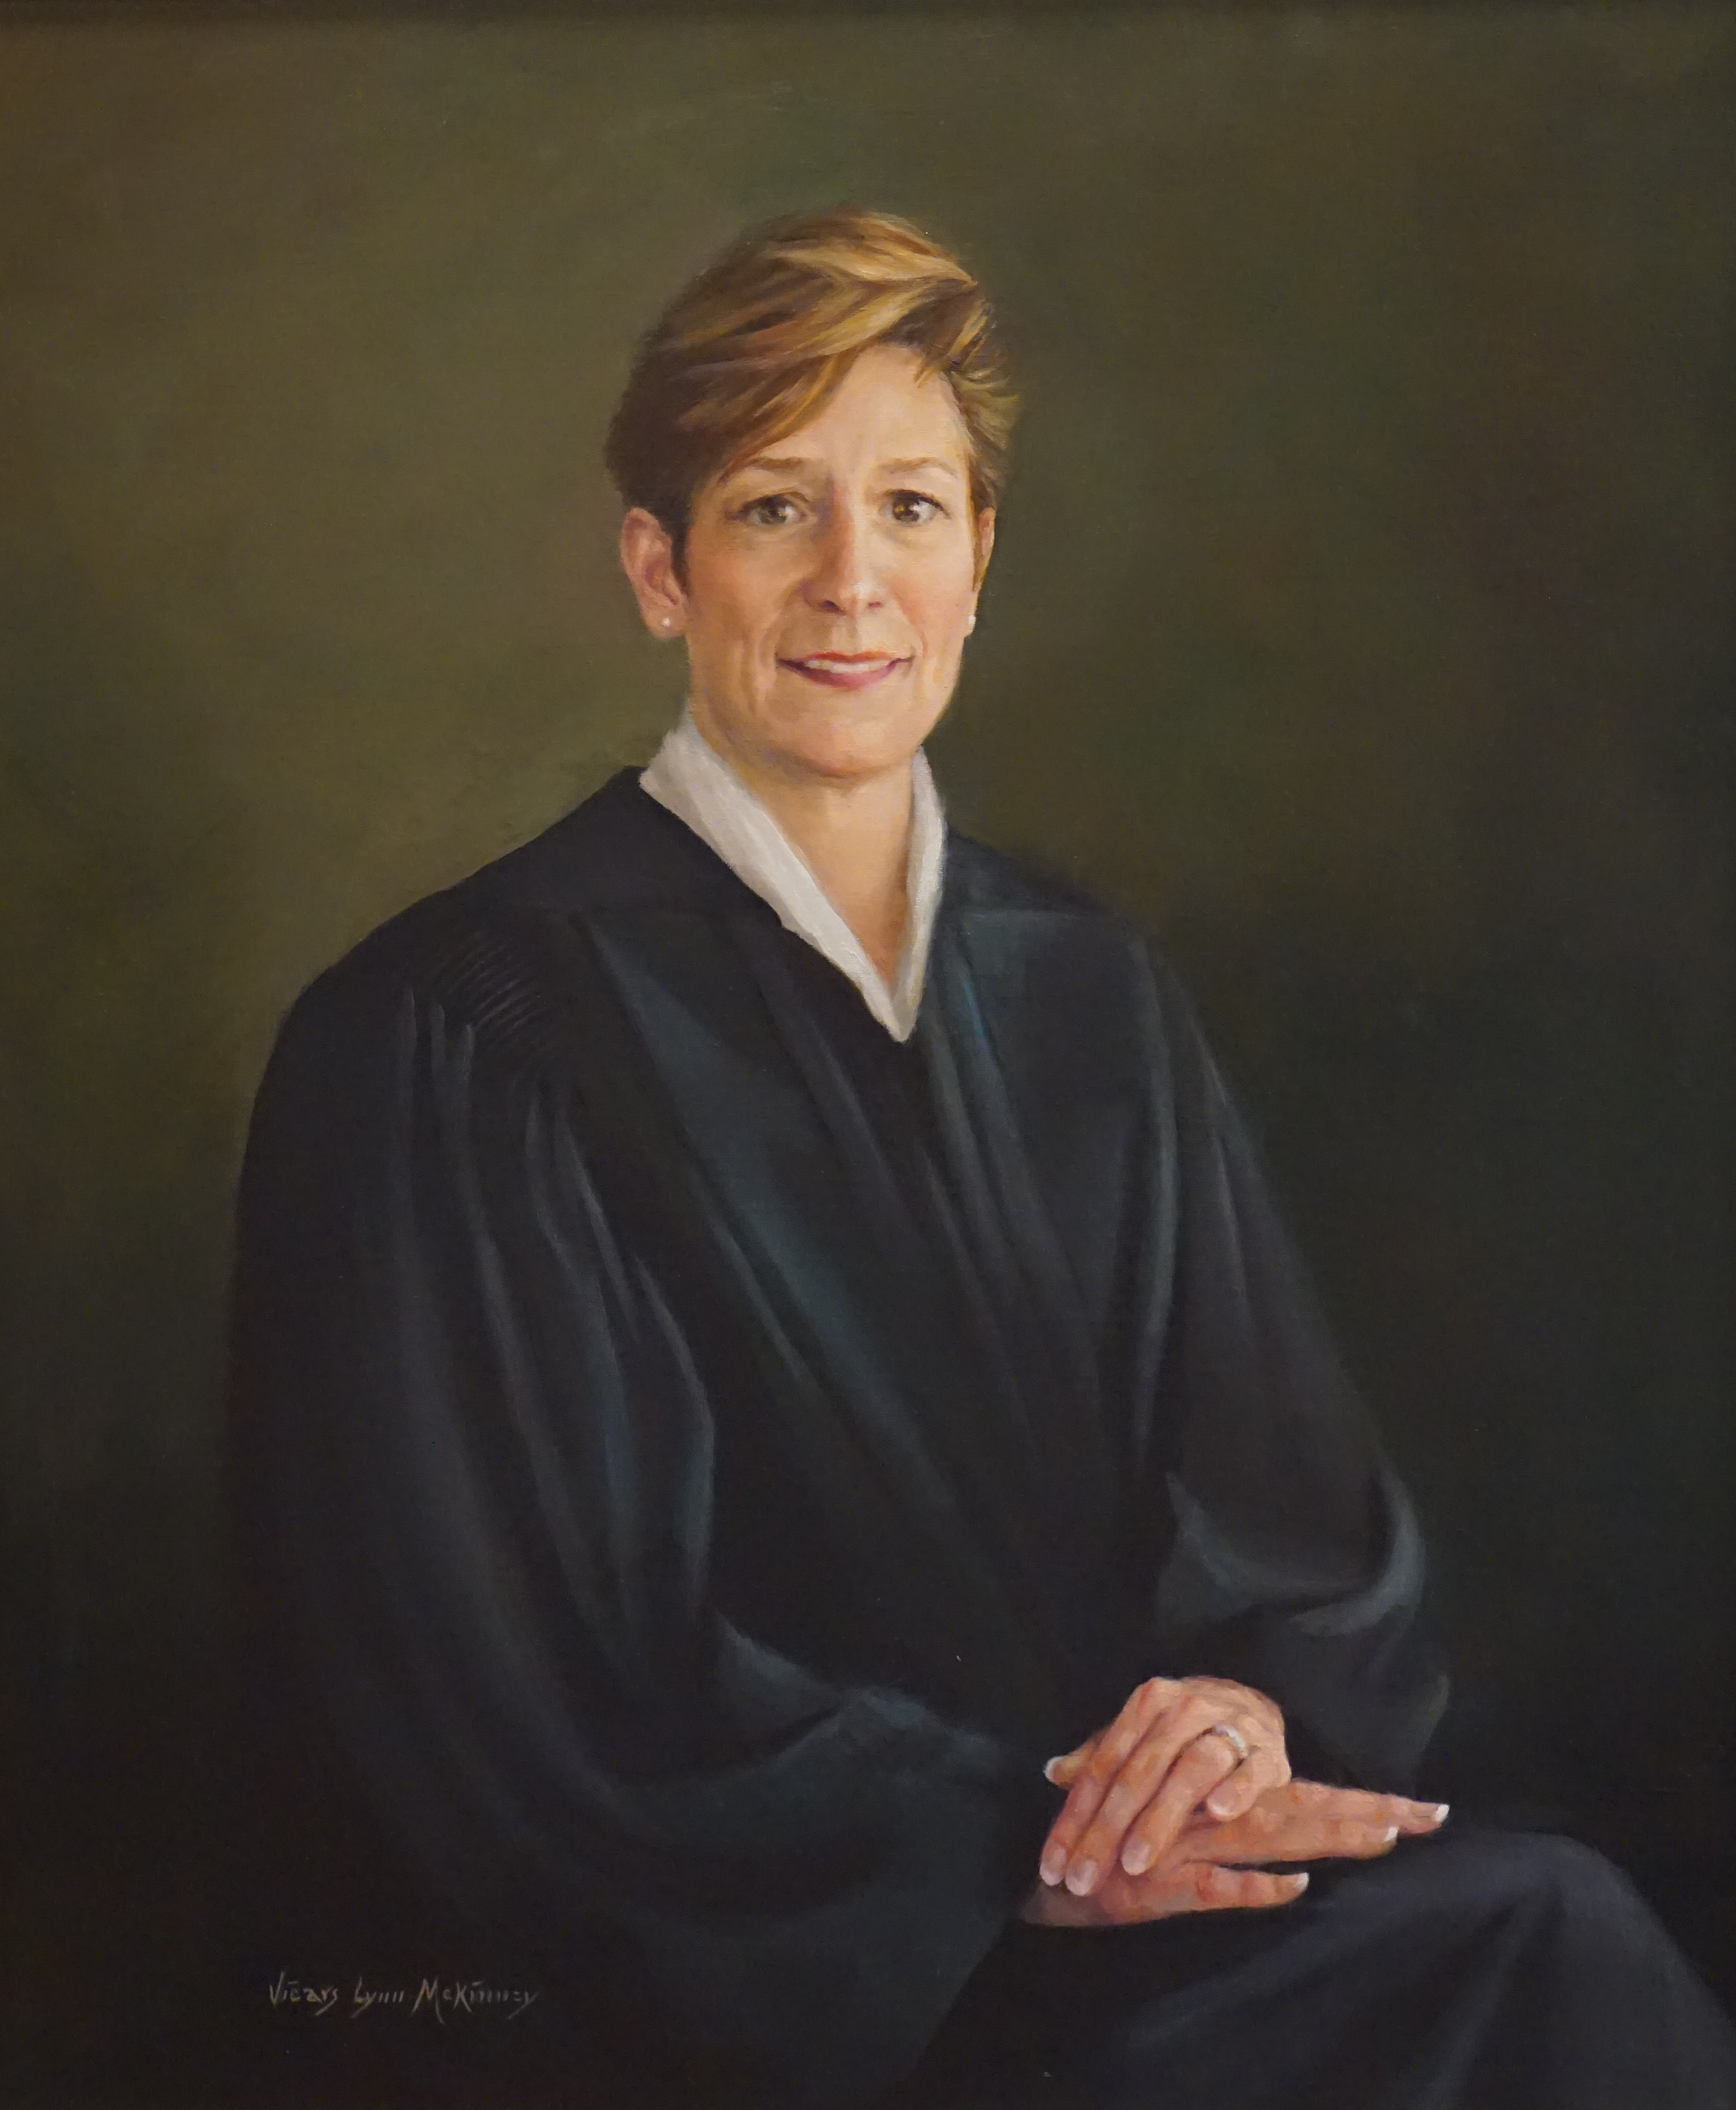 Judge Elizabeth A. McClanahan